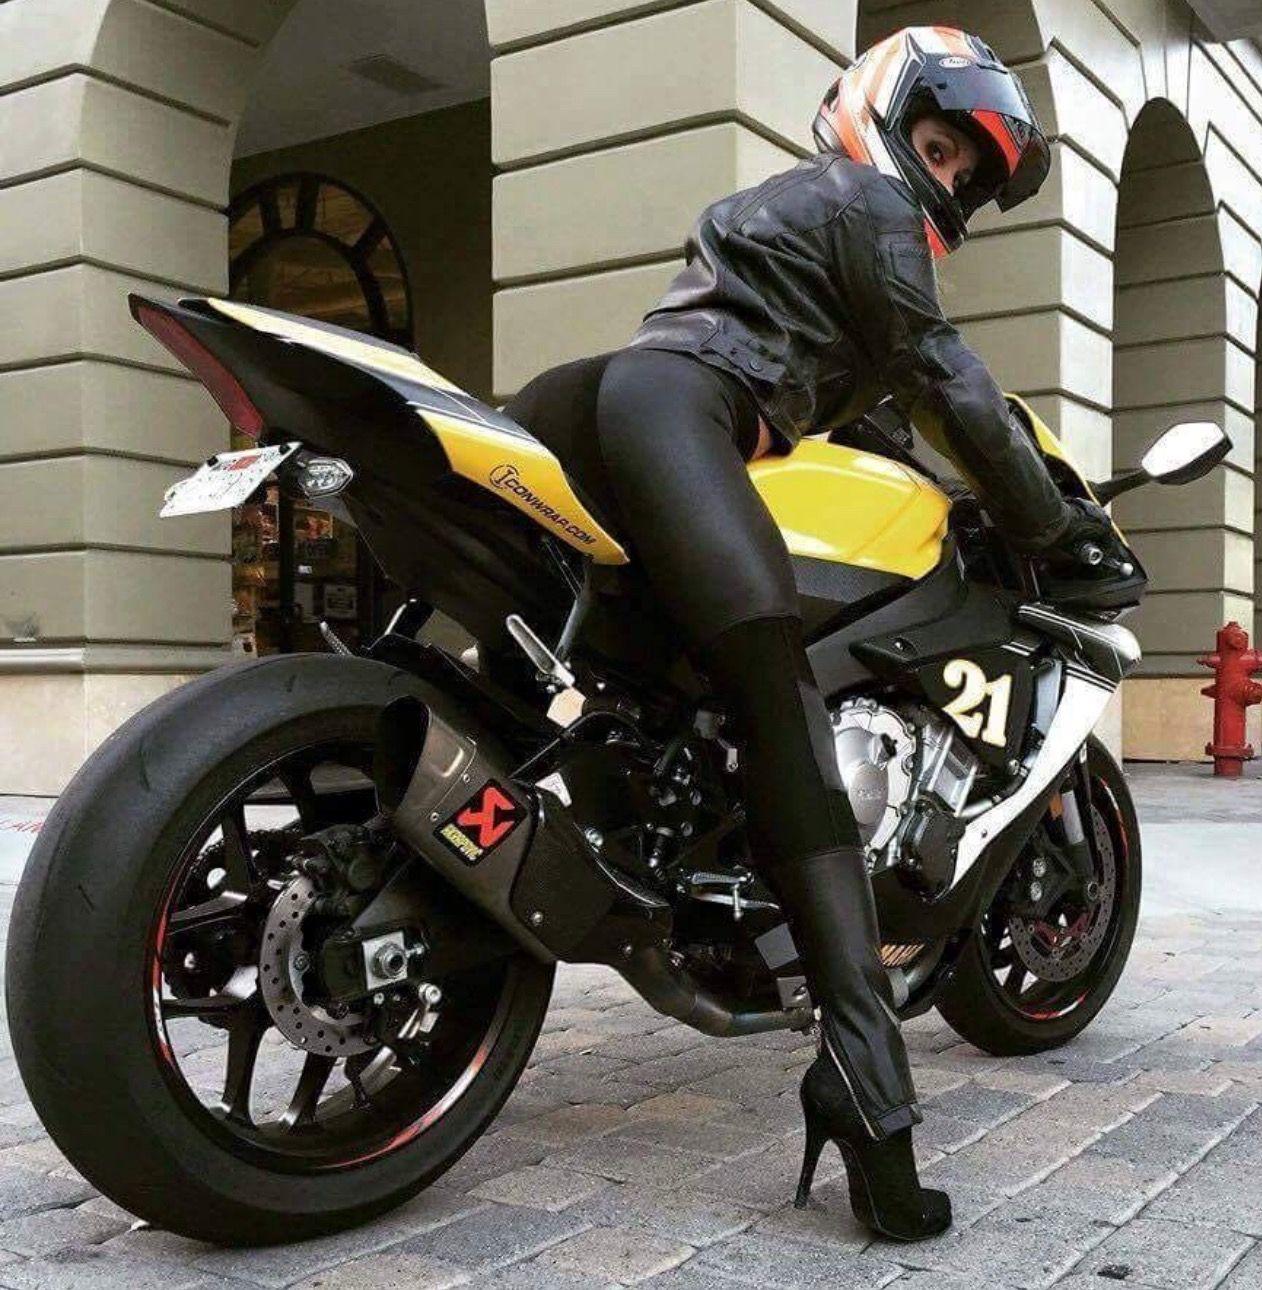 highway patrol moto pour femmes pinterest moto pour femmes moto et pour femme. Black Bedroom Furniture Sets. Home Design Ideas